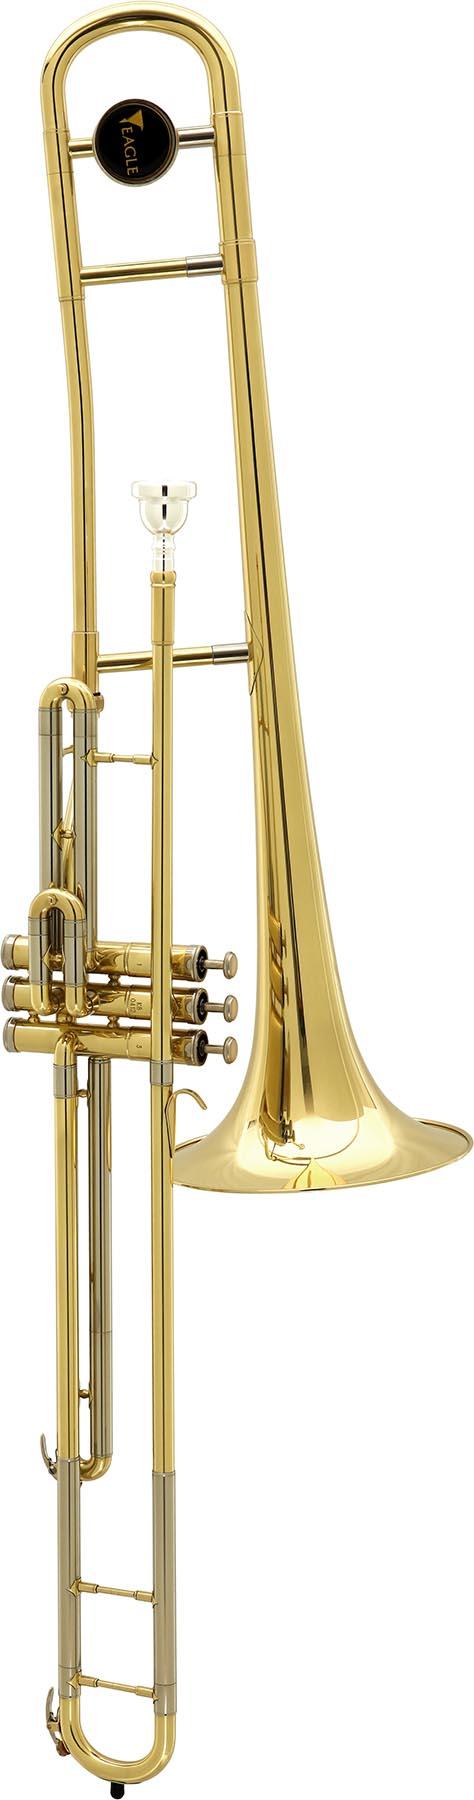 tv602 trombone de pisto longo eagle tv602 laqueado vertical